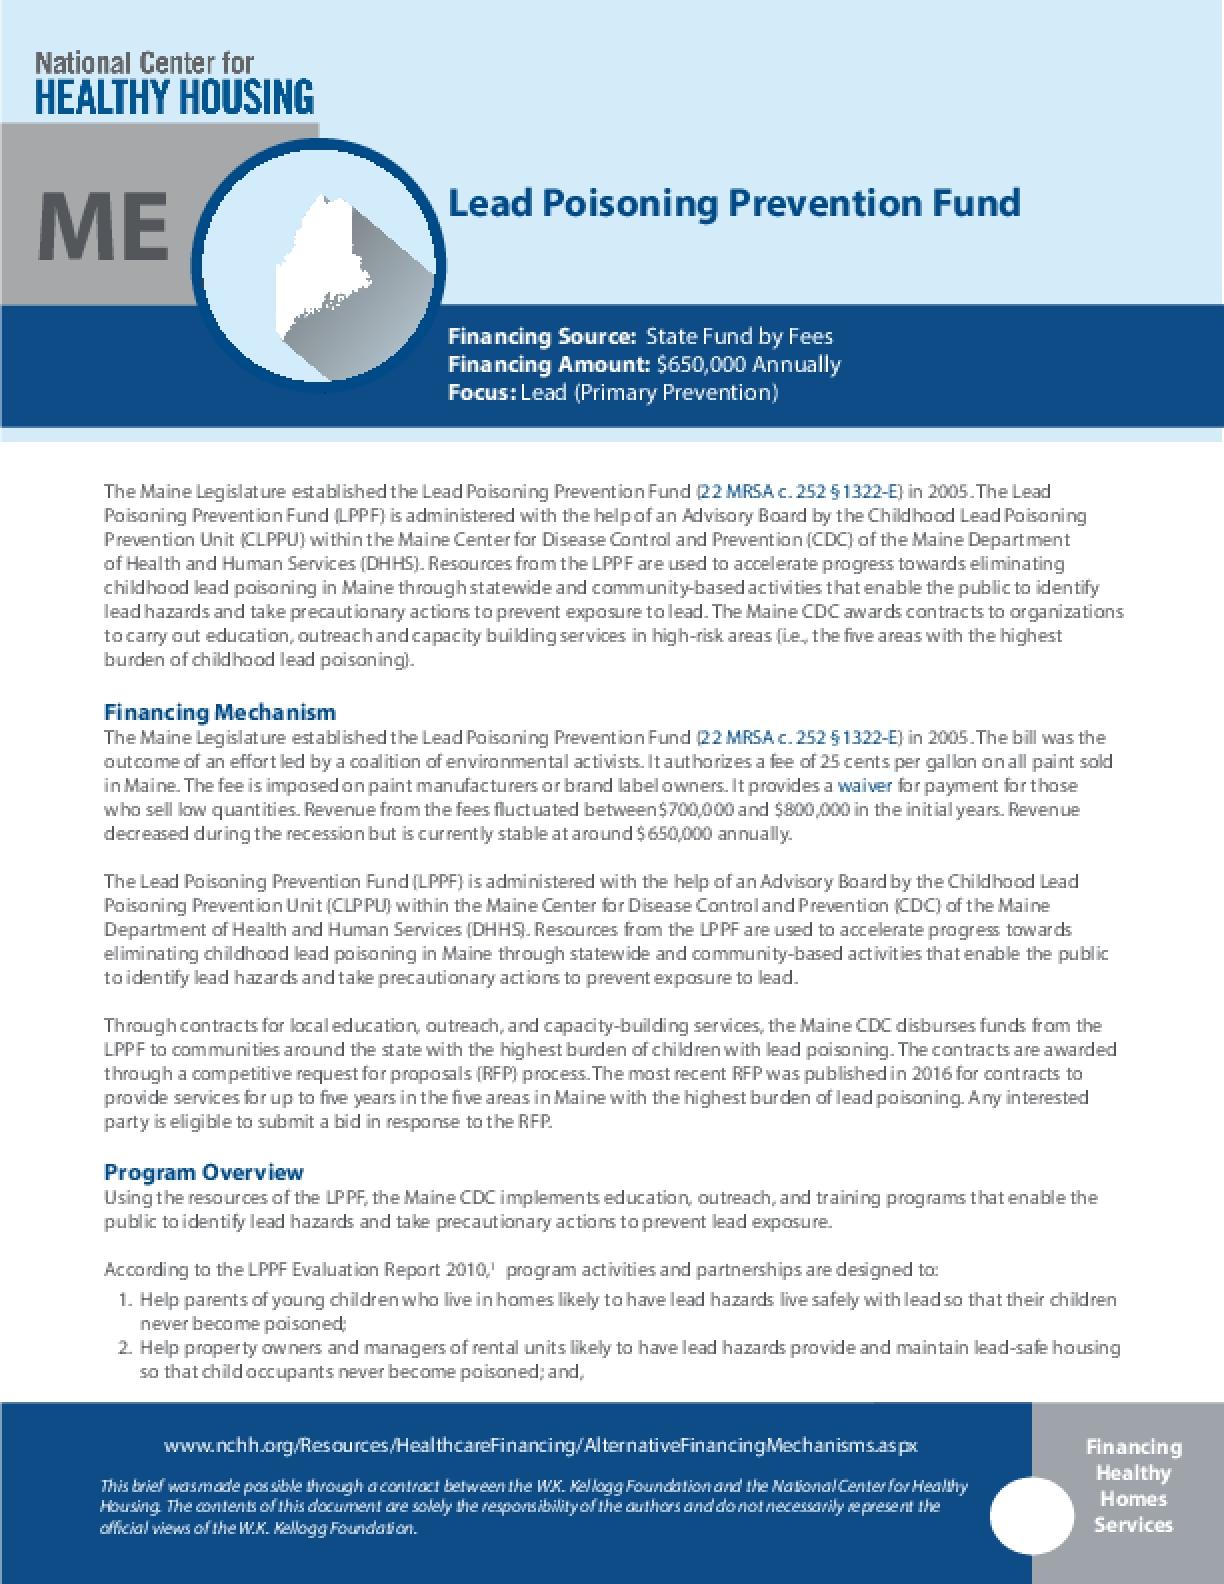 Lead Poisoning Prevention Fund